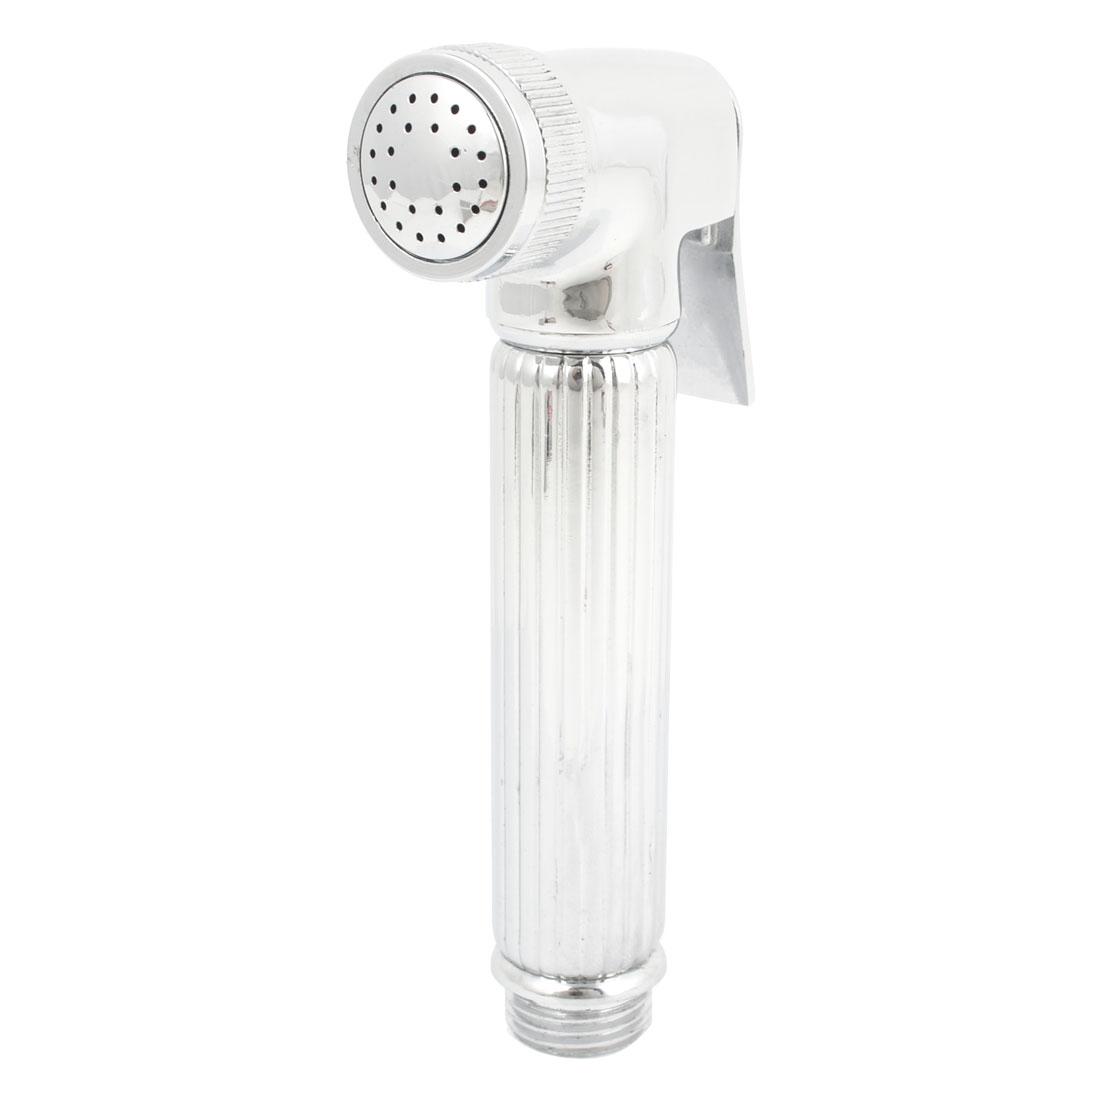 Bathroom Antislip Handle Handheld Shower Head Water Spray Silver Tone